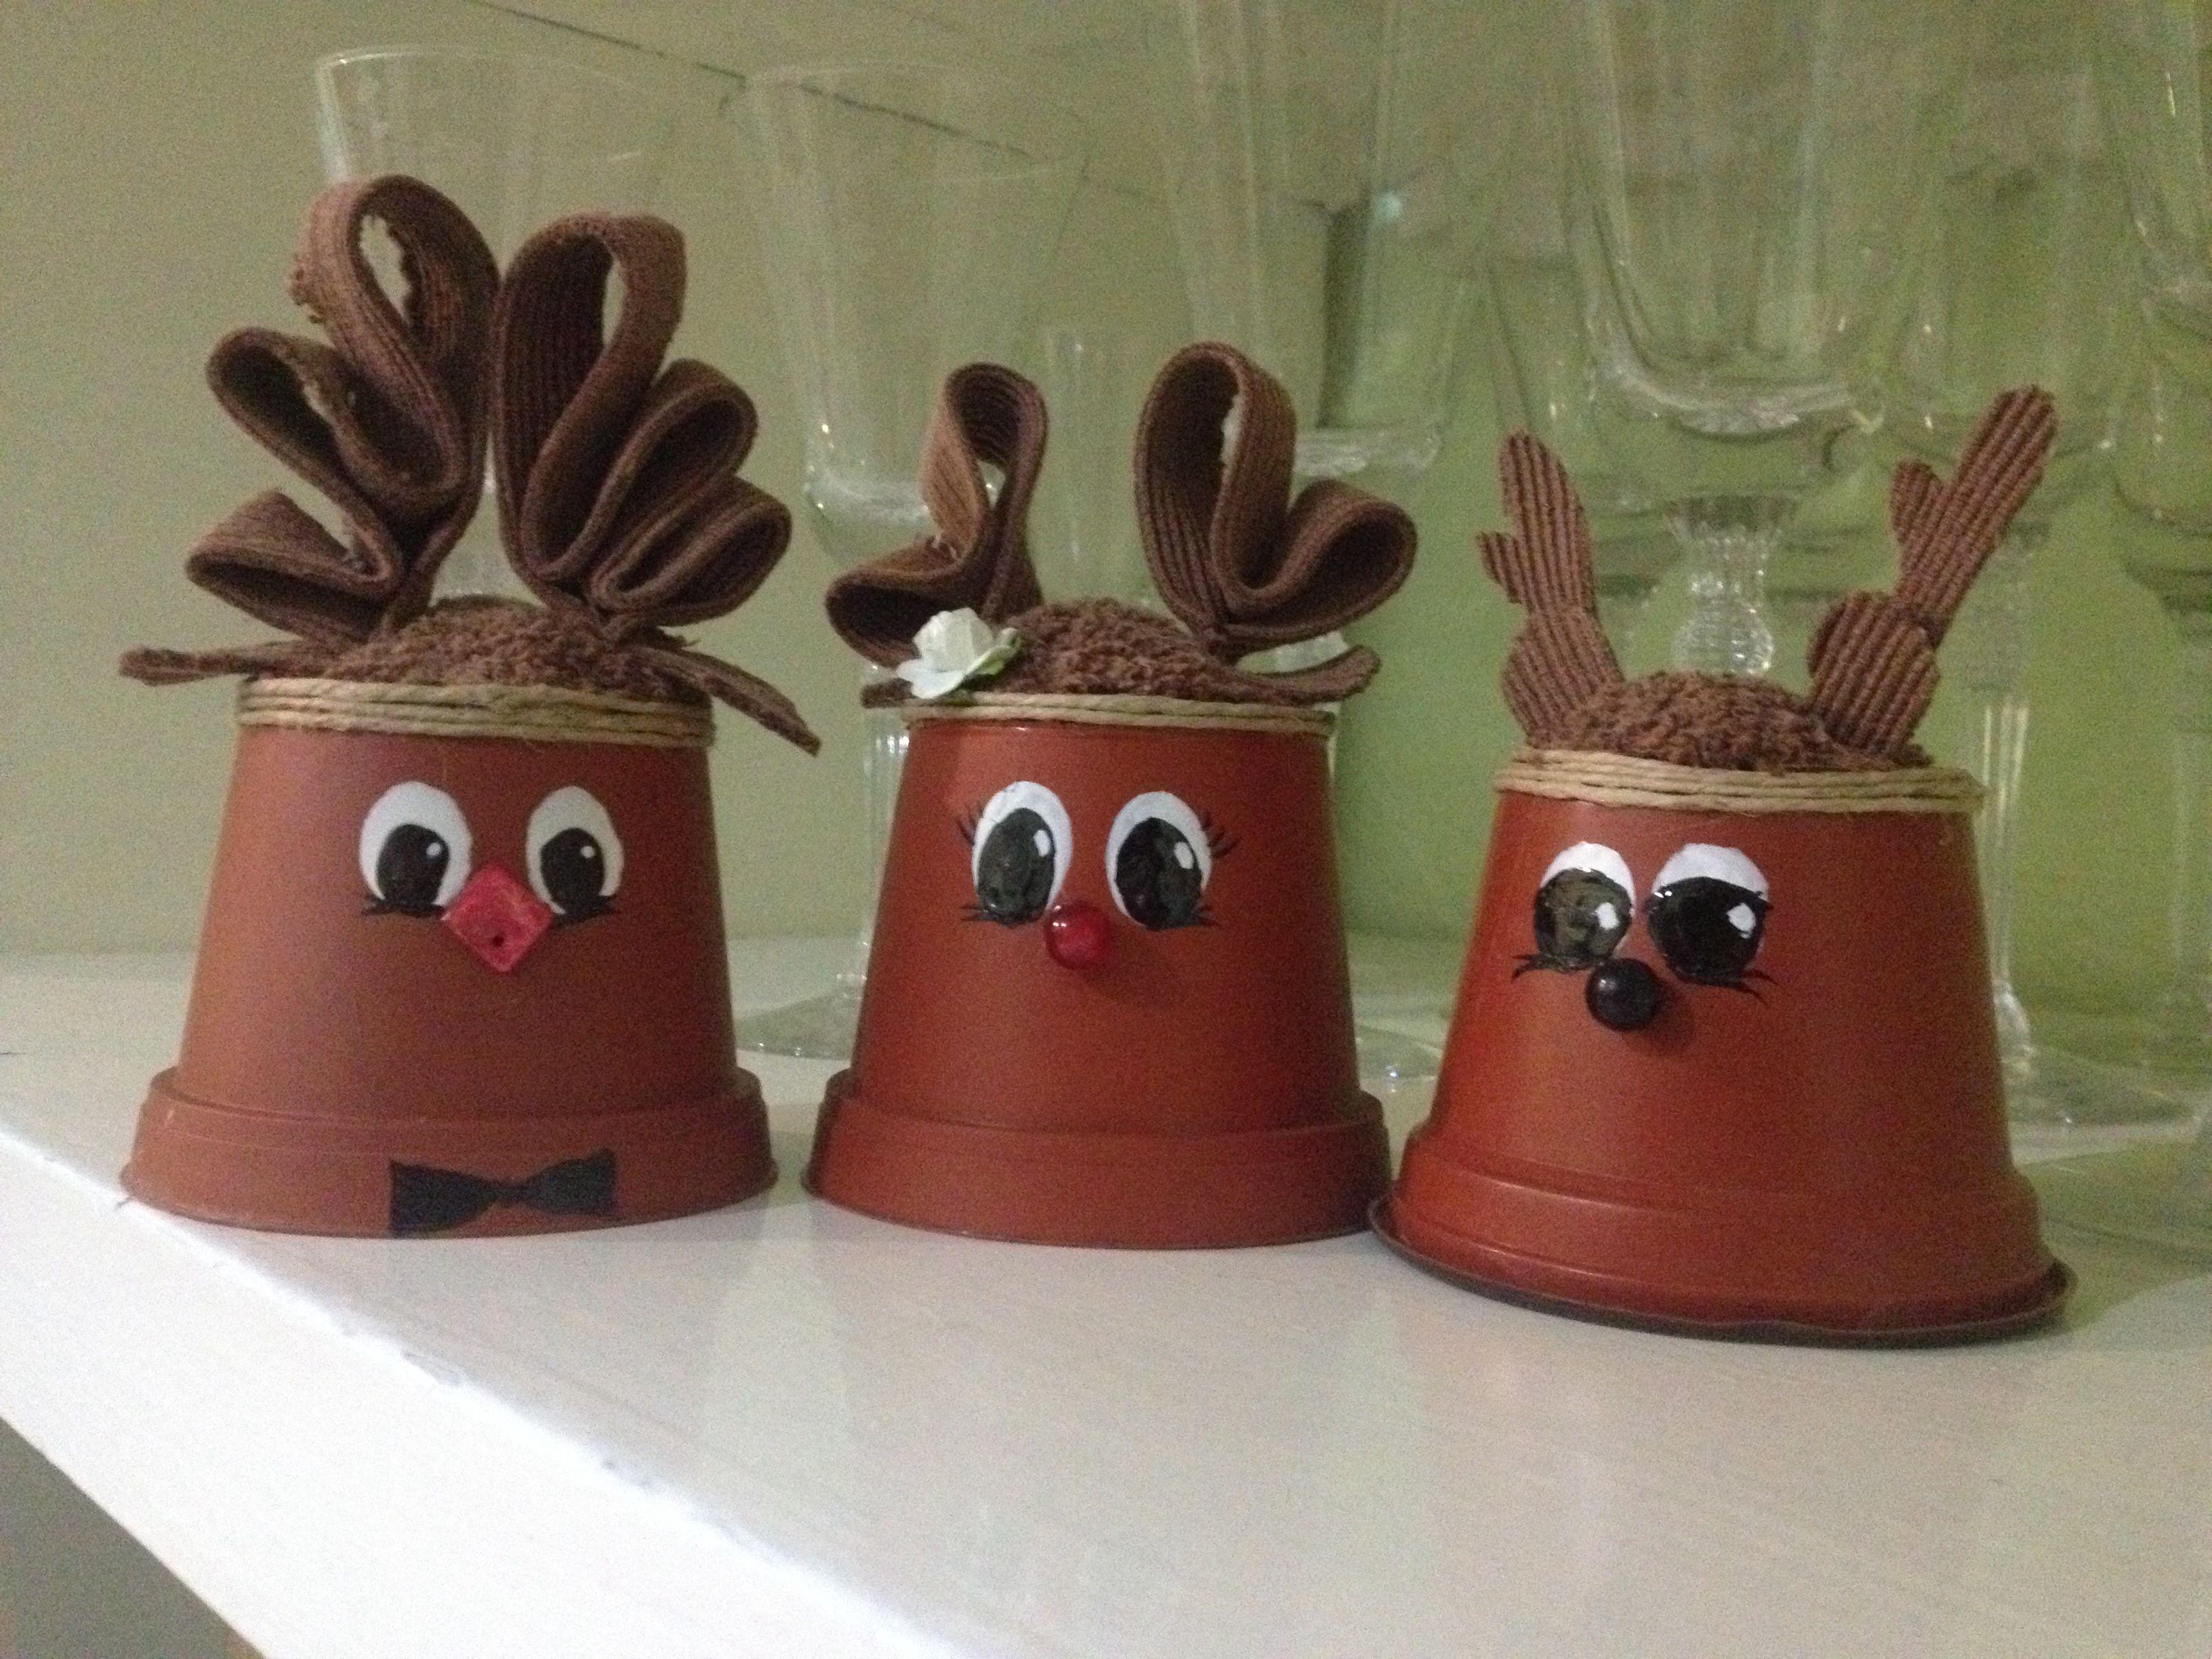 Adornos navide os caseros renos caseros adornos for Navidad adornos manualidades navidenas